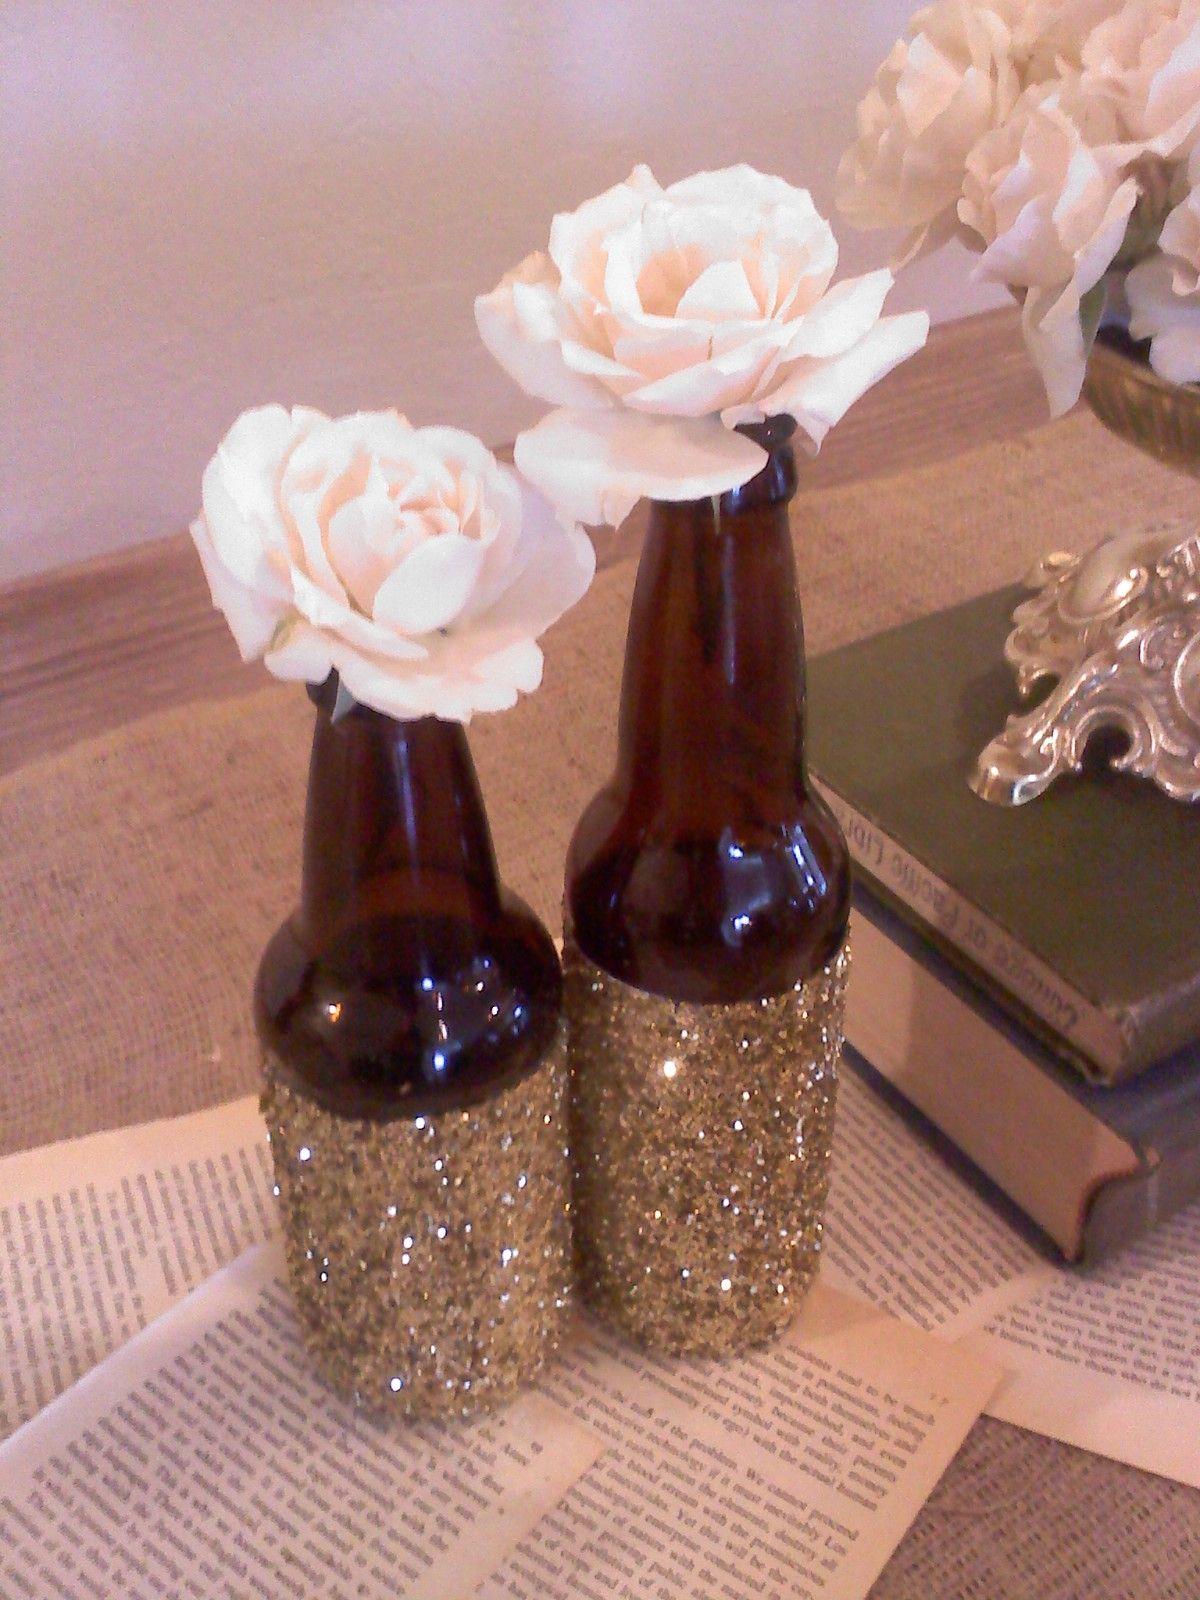 Glitter Beer Bottle I Would Do The Whole Bottle In Glitter As